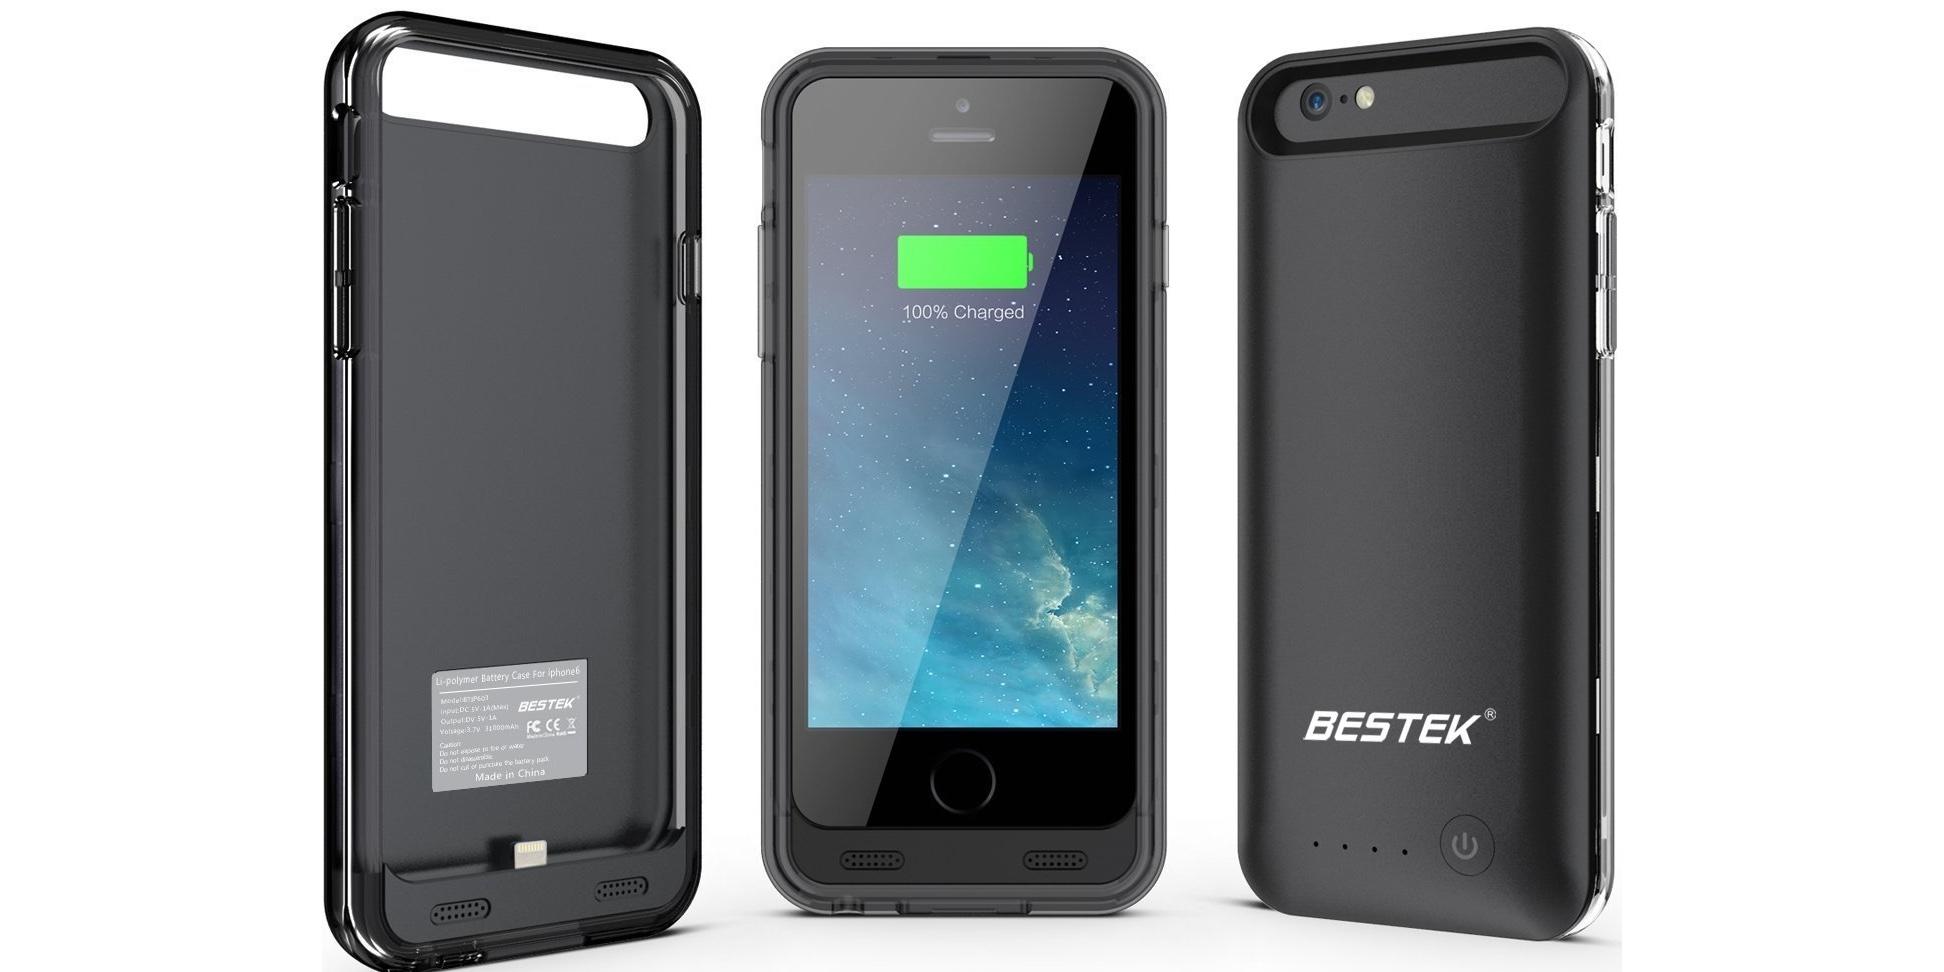 Bestek-iphone-6-cable